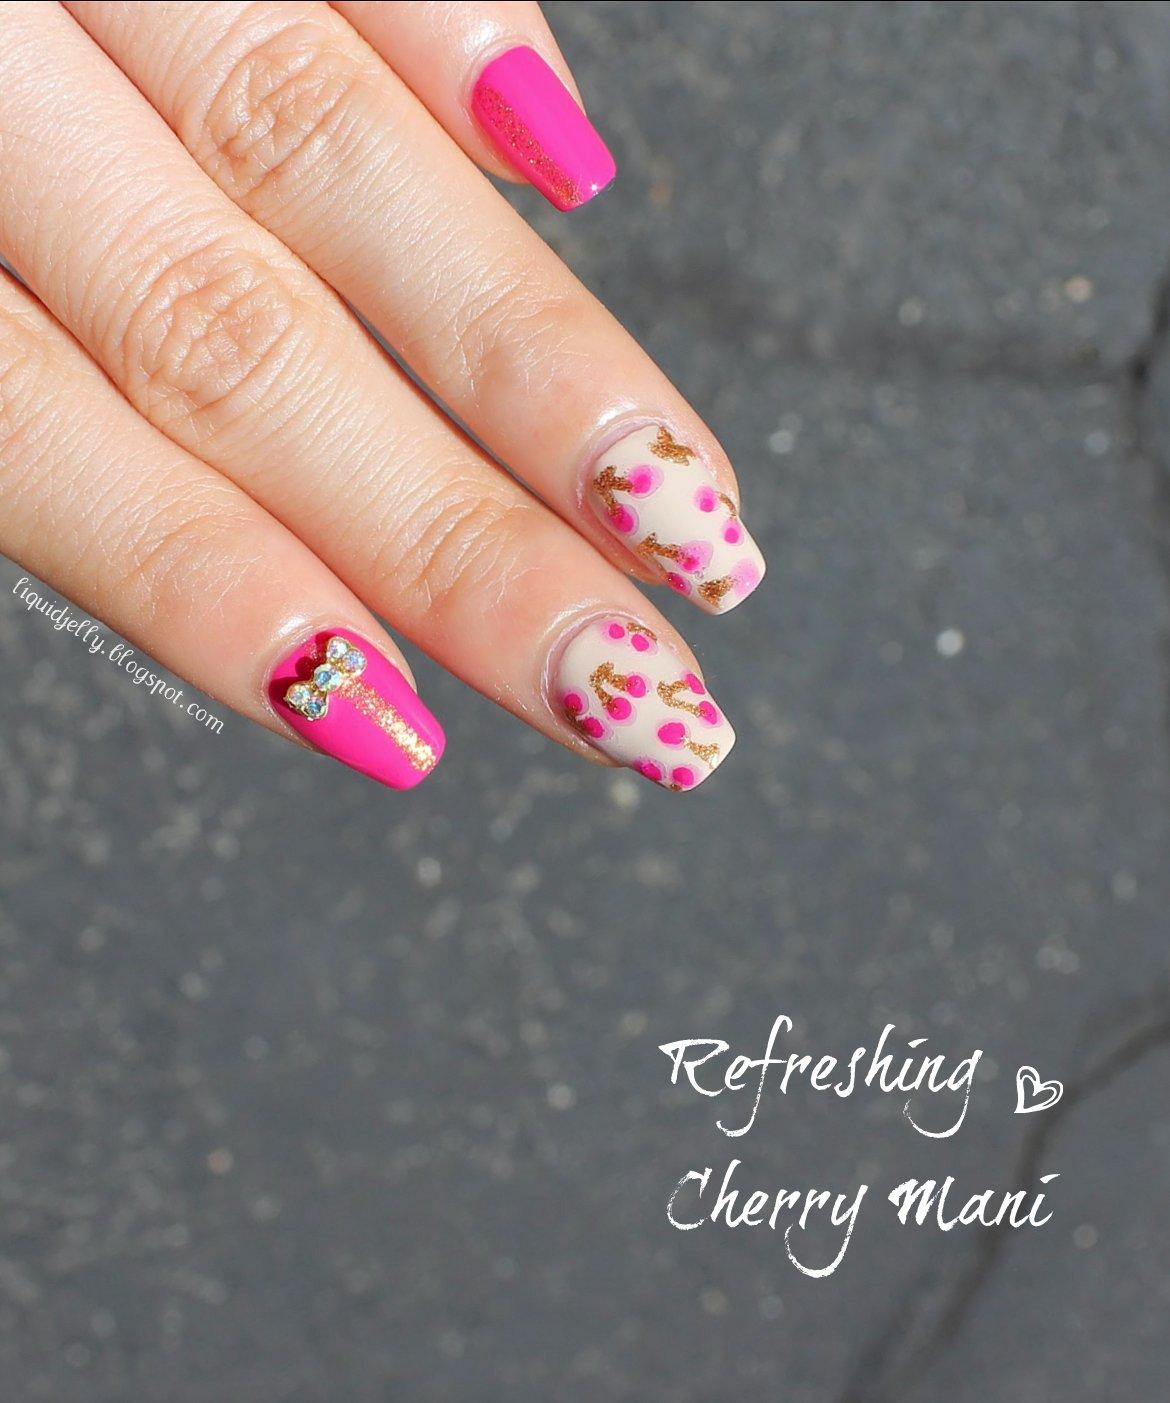 Liquid Jelly: [Nail Art] Refreshing Cherry Mani with BPS Bow Charm